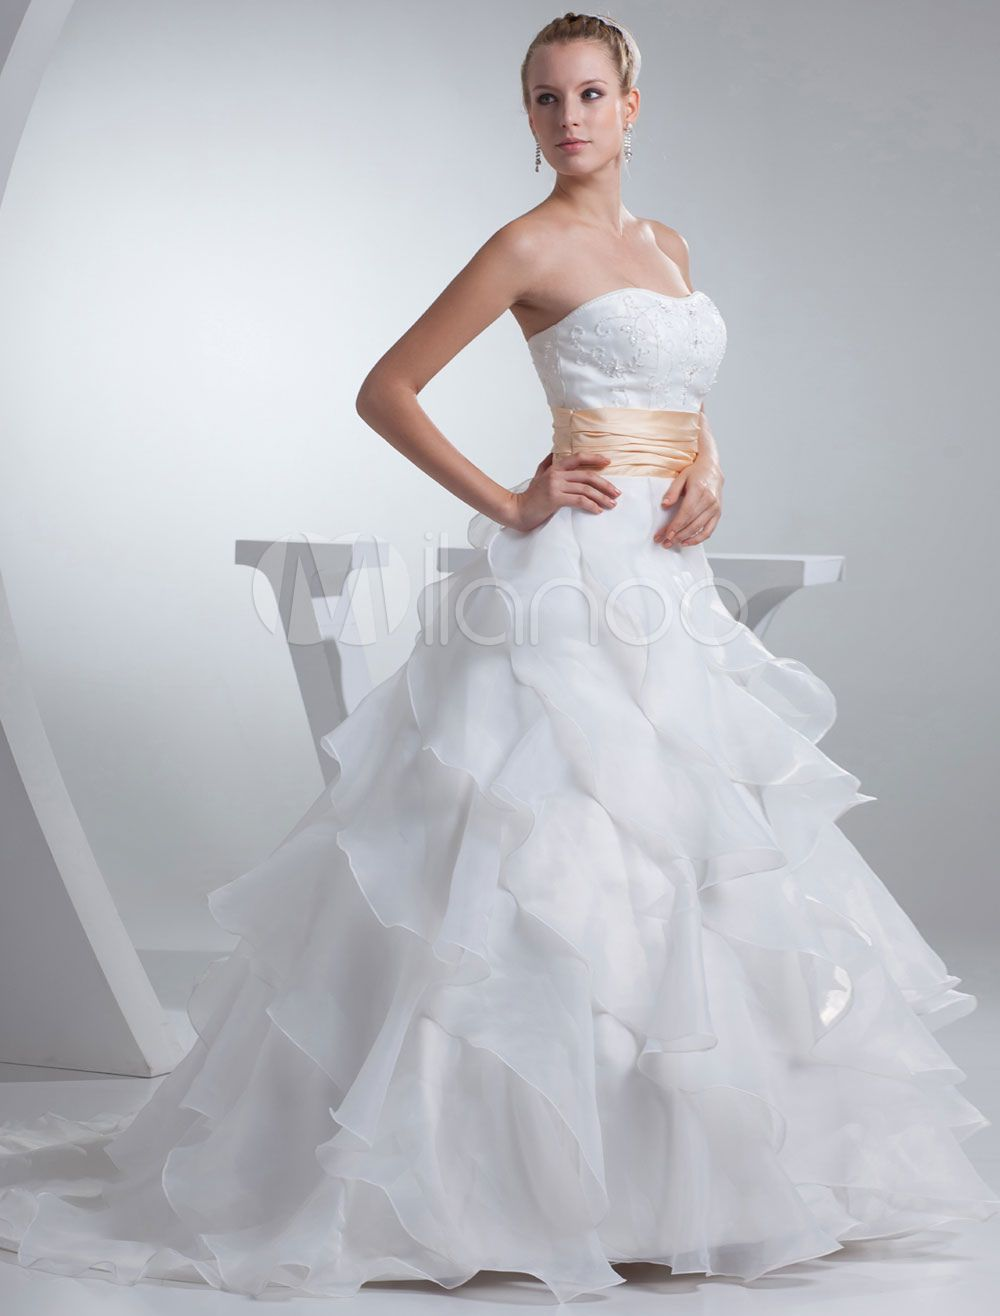 Strapless Wedding Dress A-Line Satin Beading Sash Pleated Organza Ruffles Chaple Train Bridal Dress